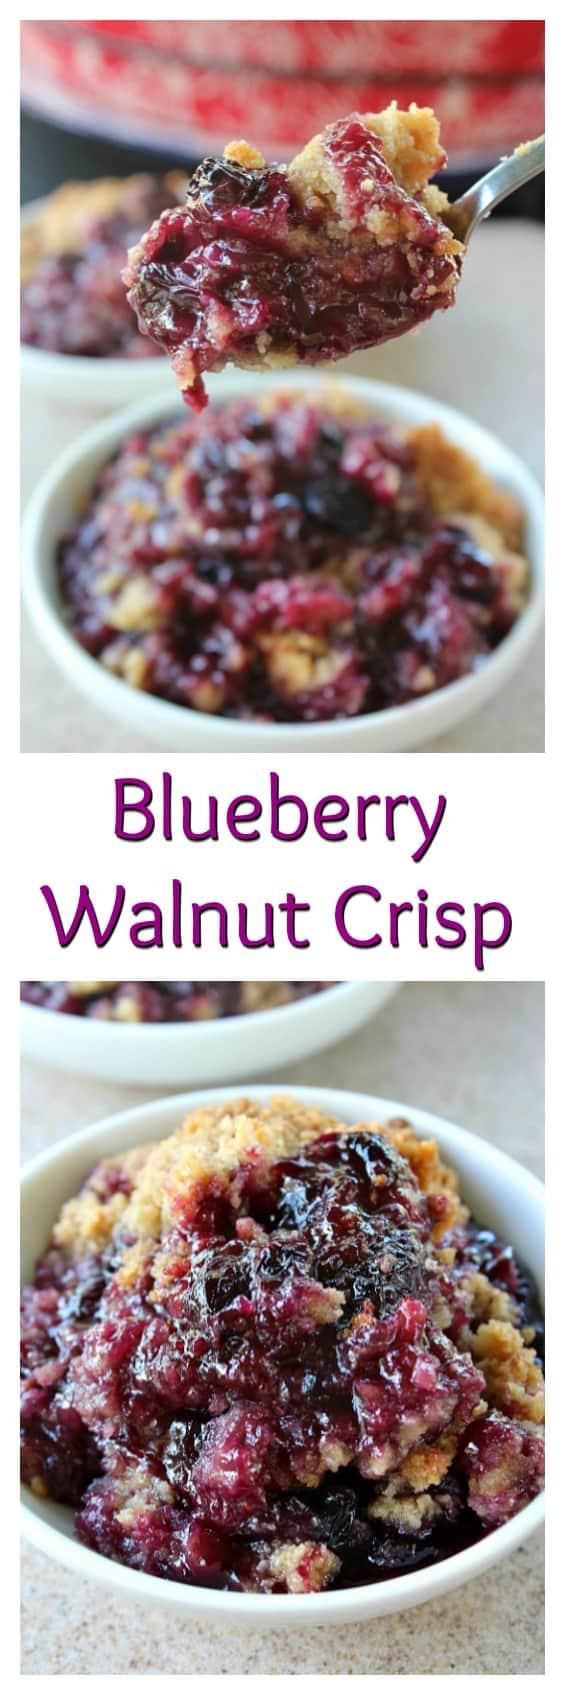 Blueberry Walnut Crisp